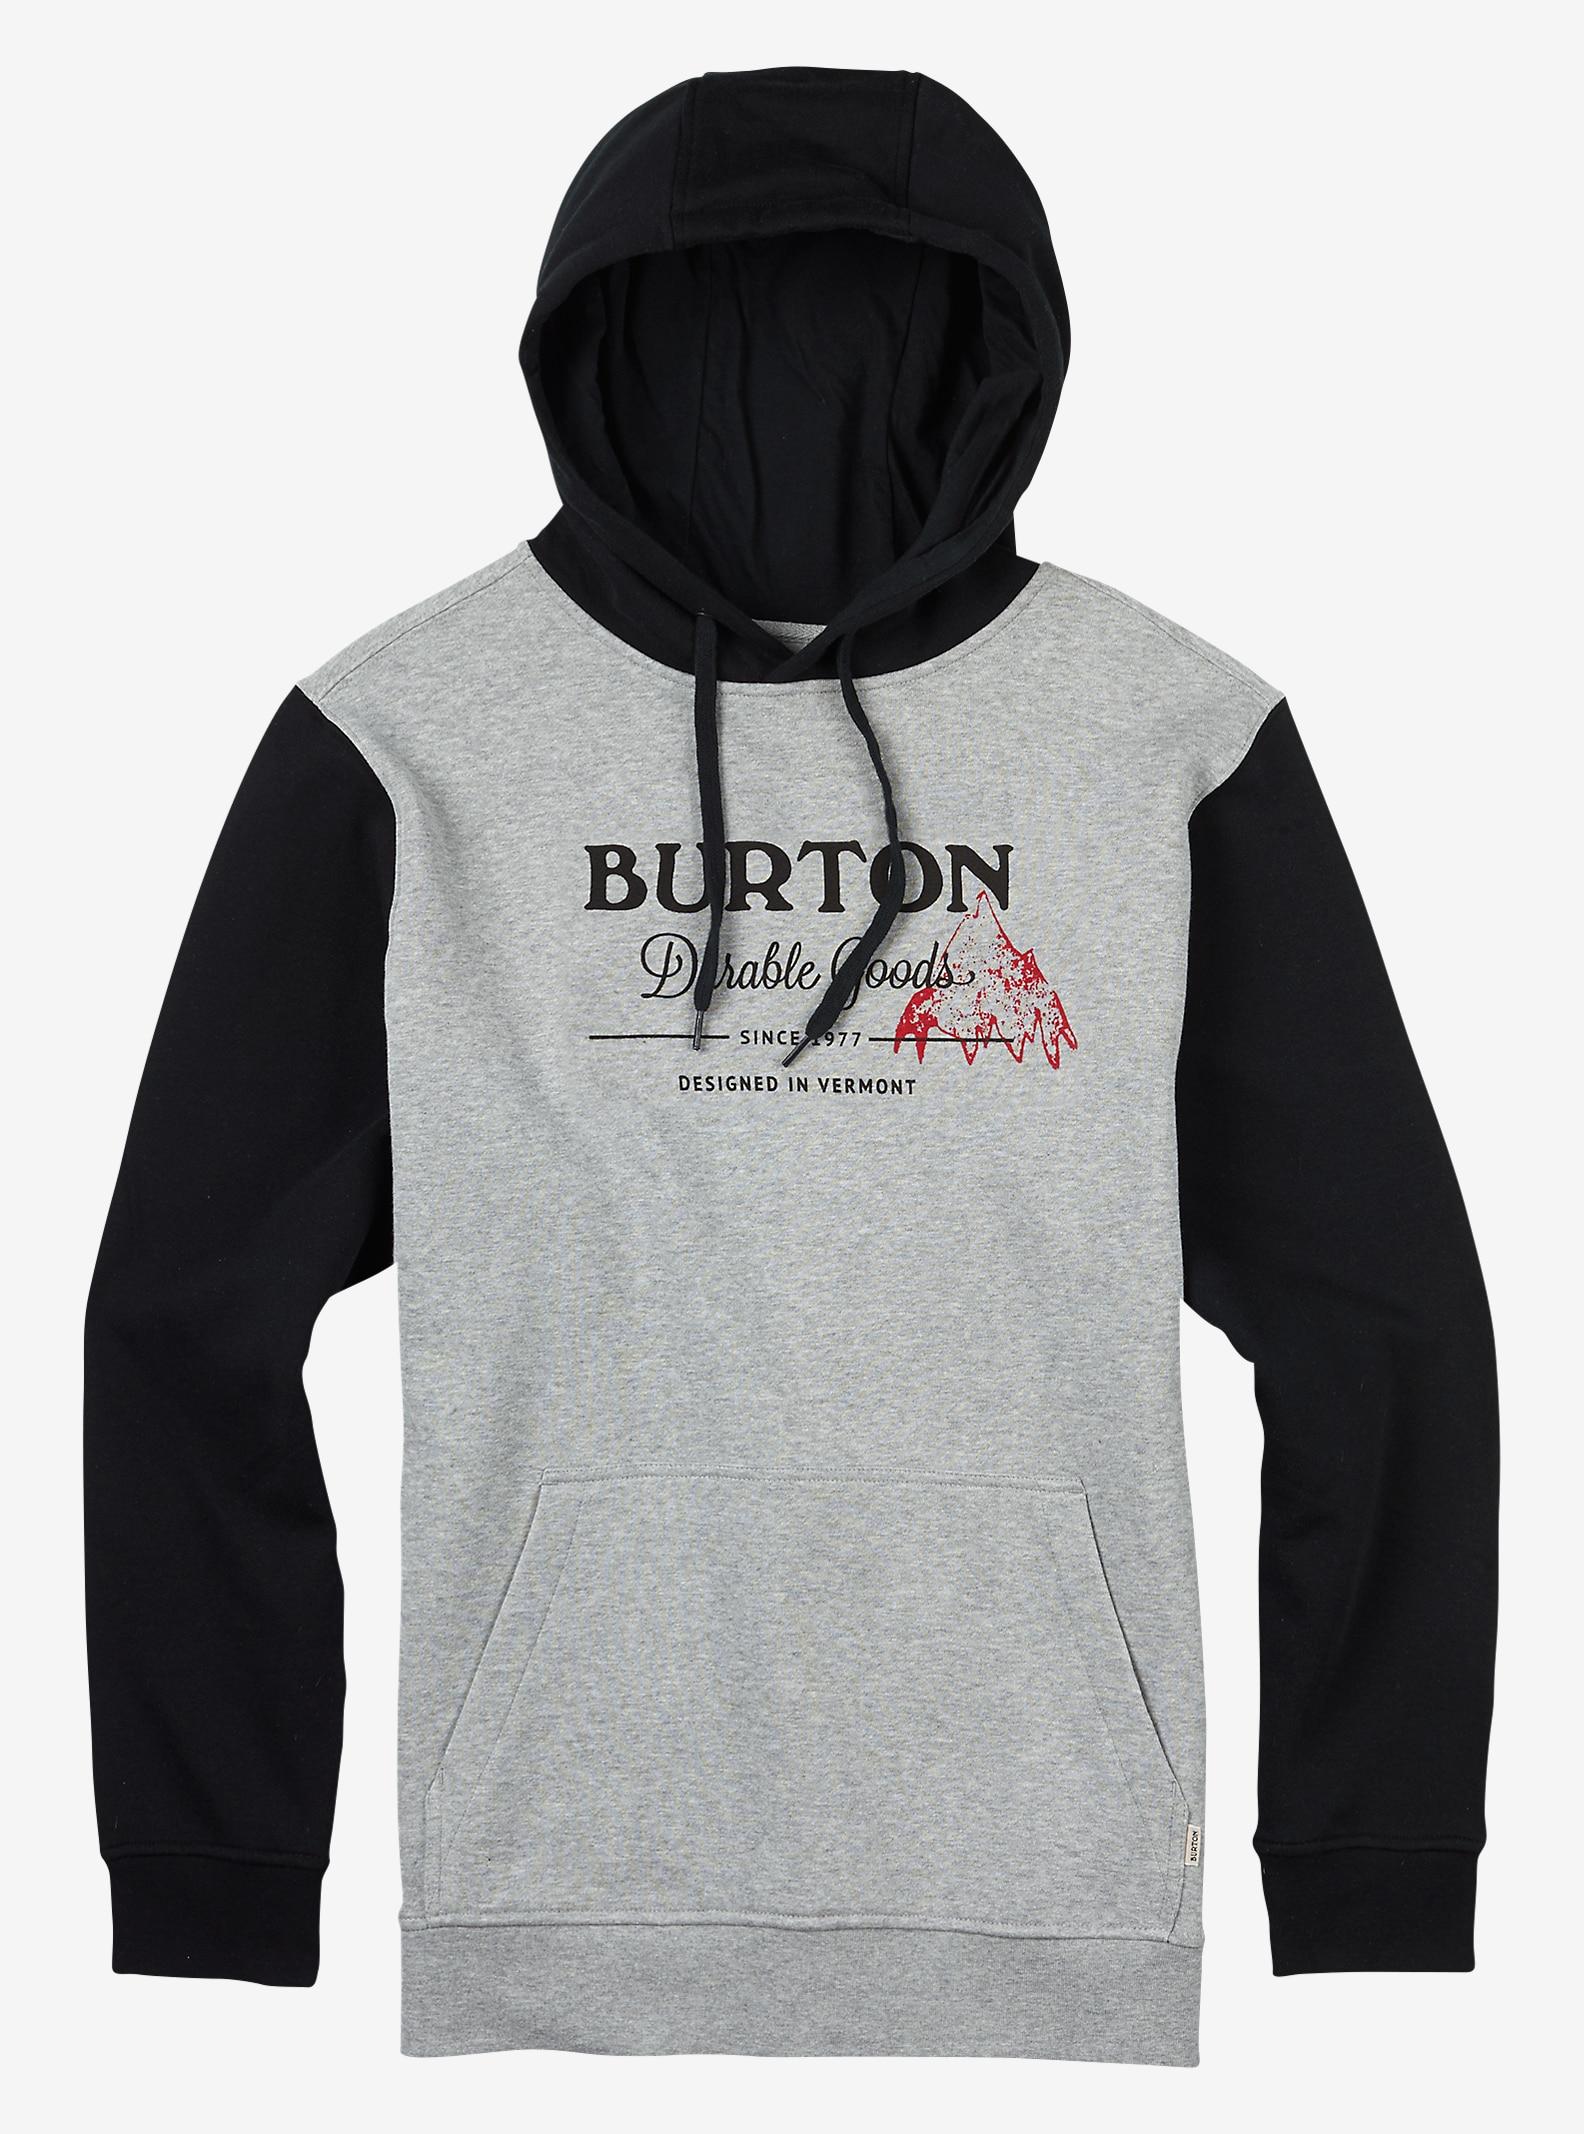 Burton Durable Goods Pullover Hoodie shown in Gray Heather